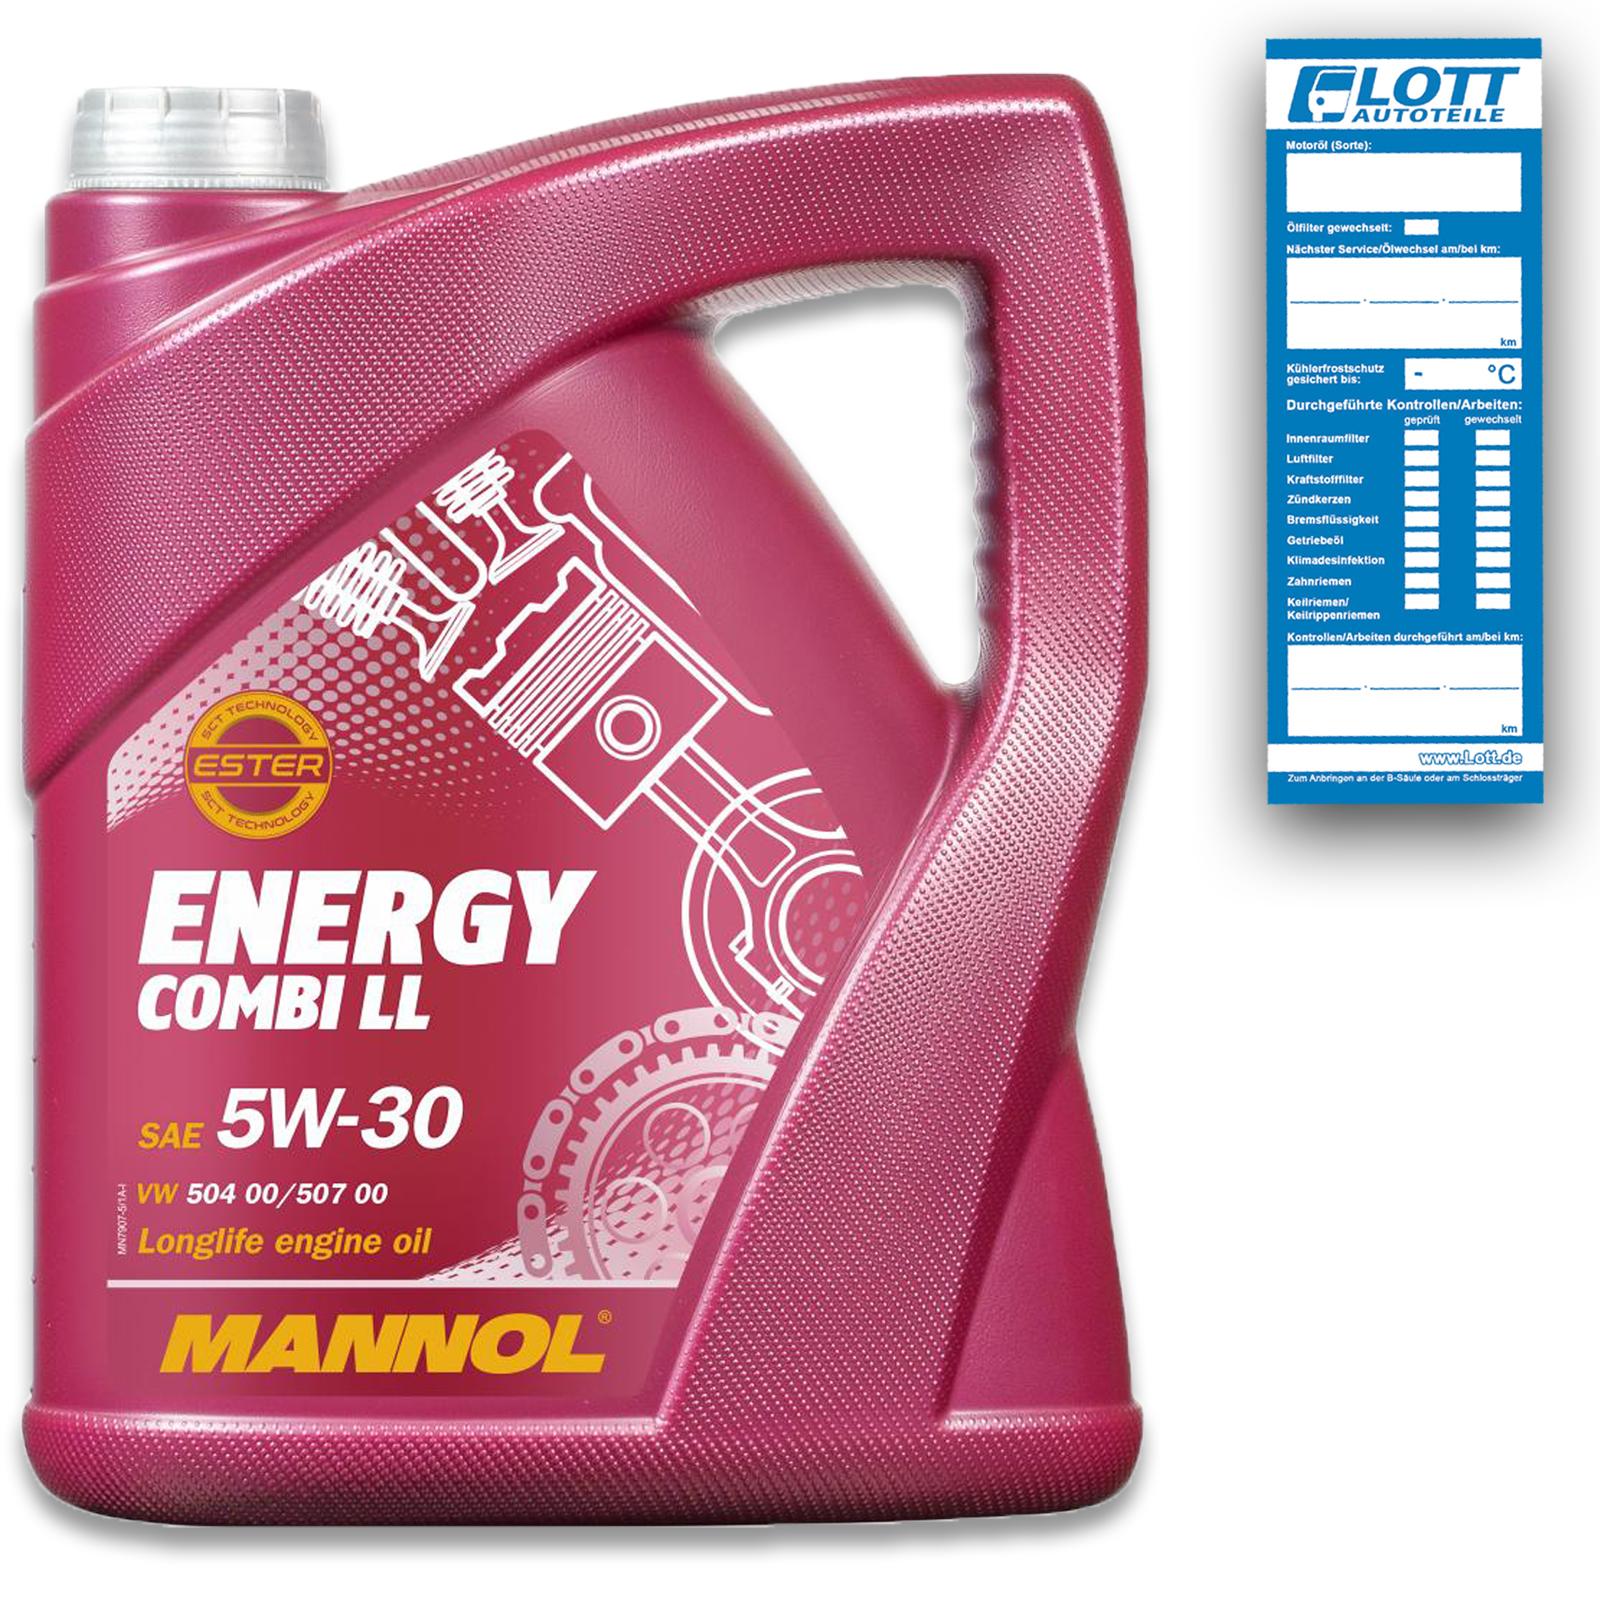 MOTORÖL MANNOL ENERGY COMBI LL 5W-30 5 Liter